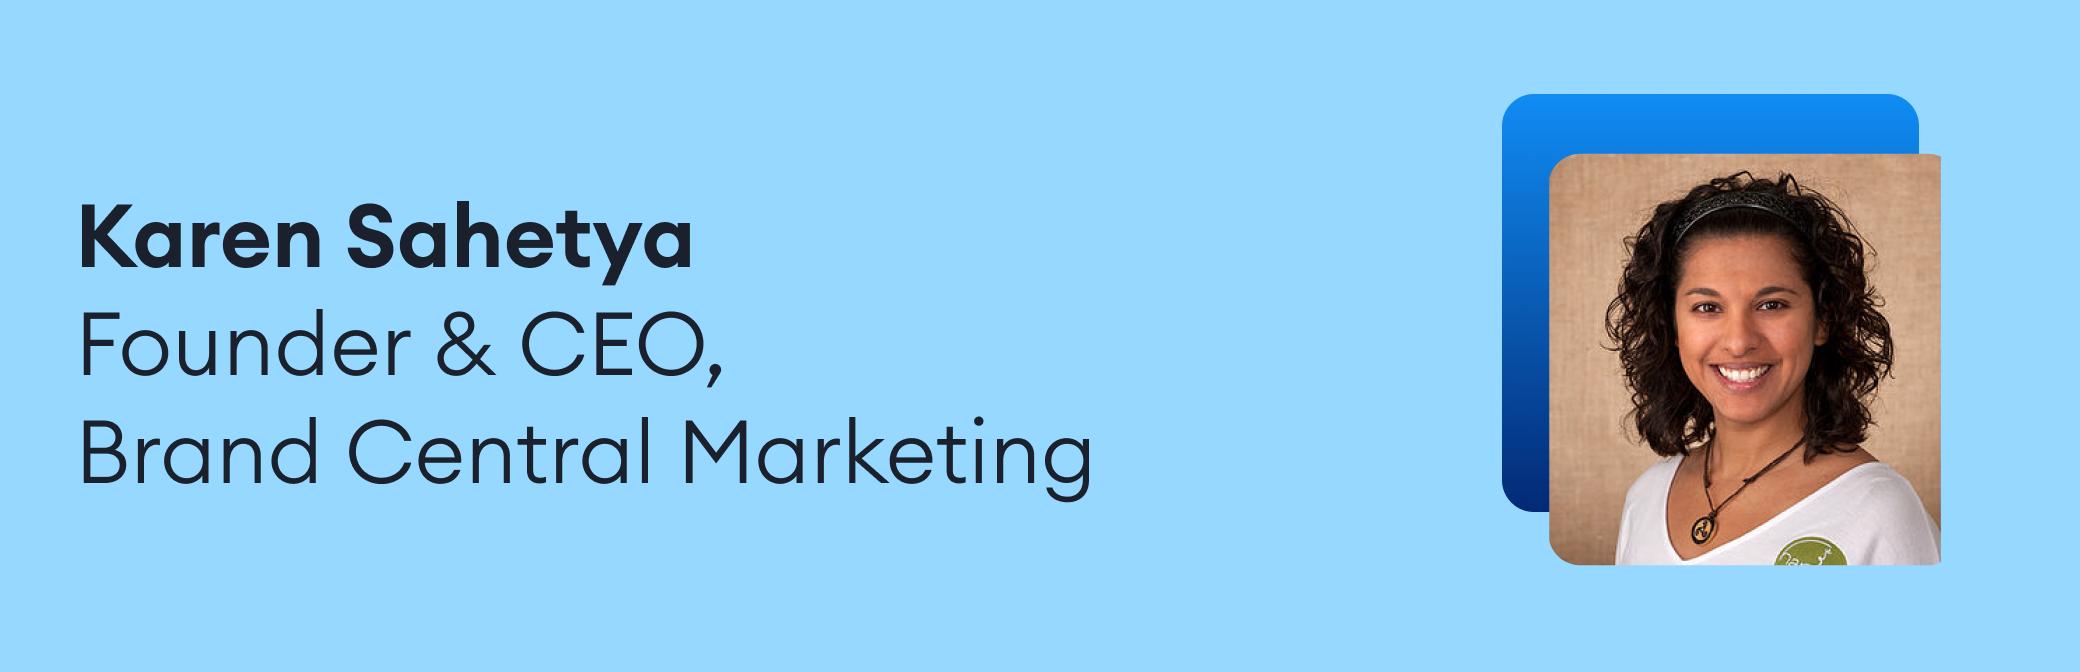 karen sahetya brand central marketing